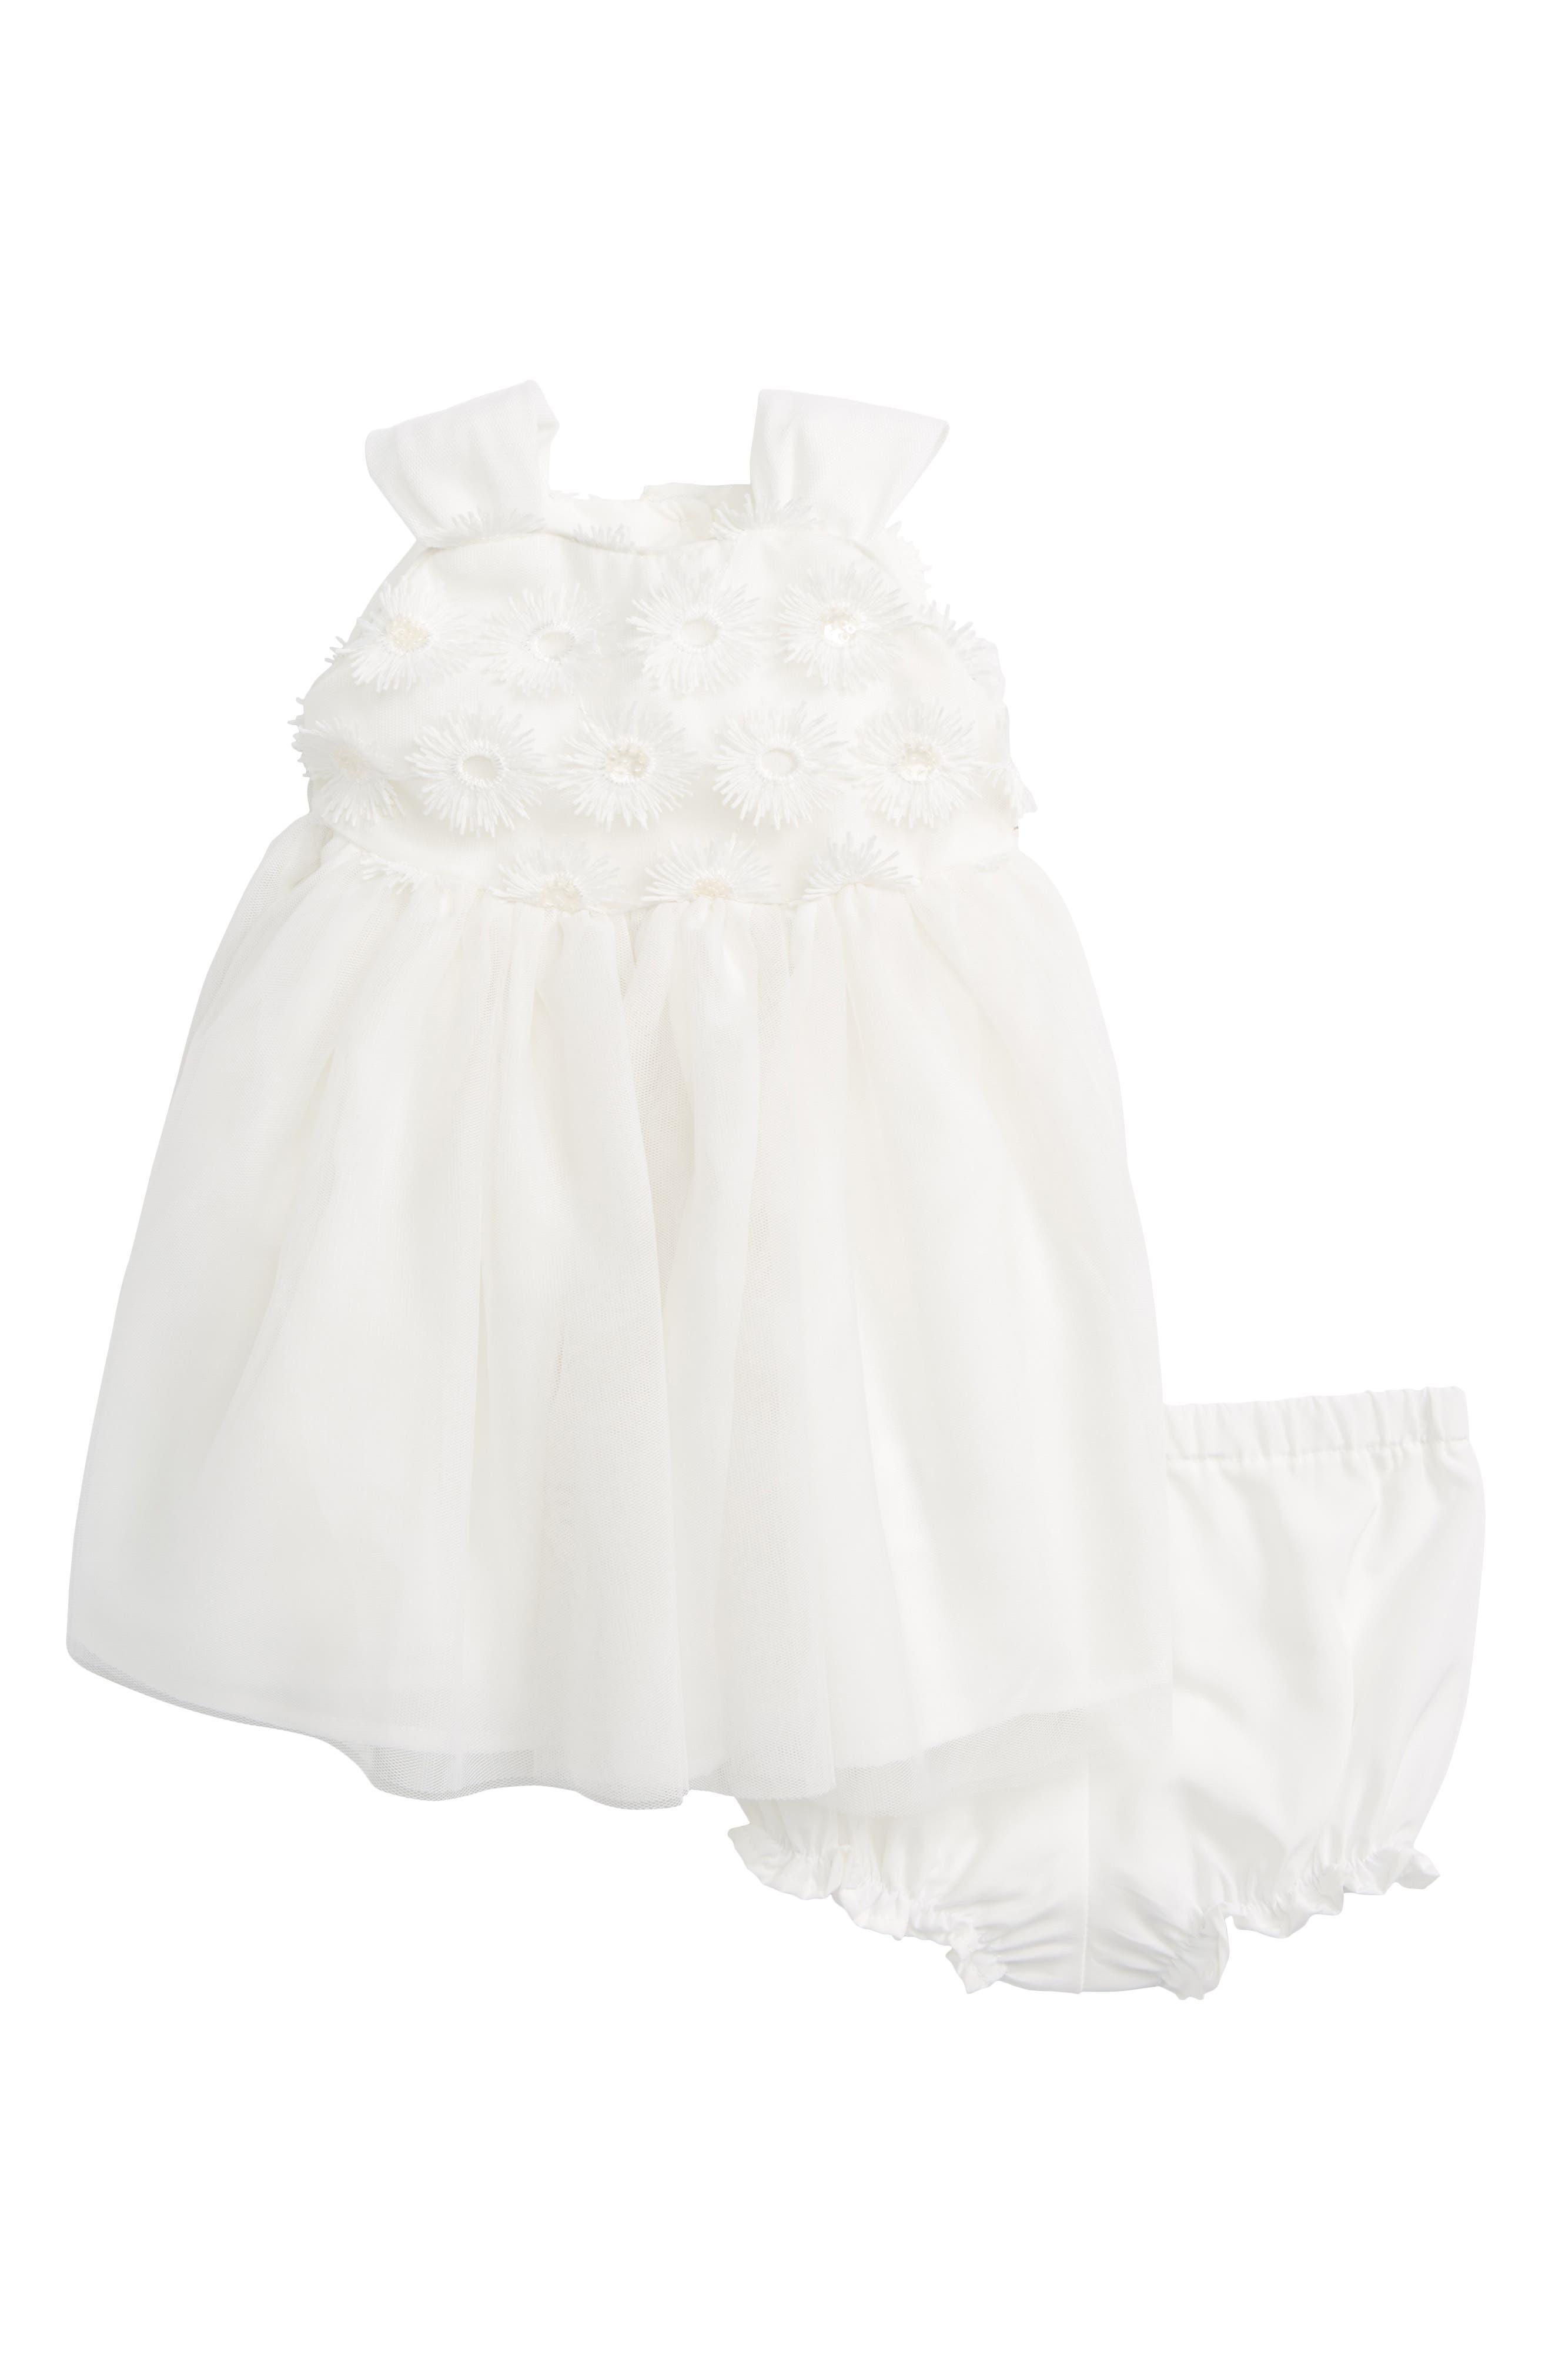 Pippa & Julie Daisy Sleeveless Dress (Baby Girls)